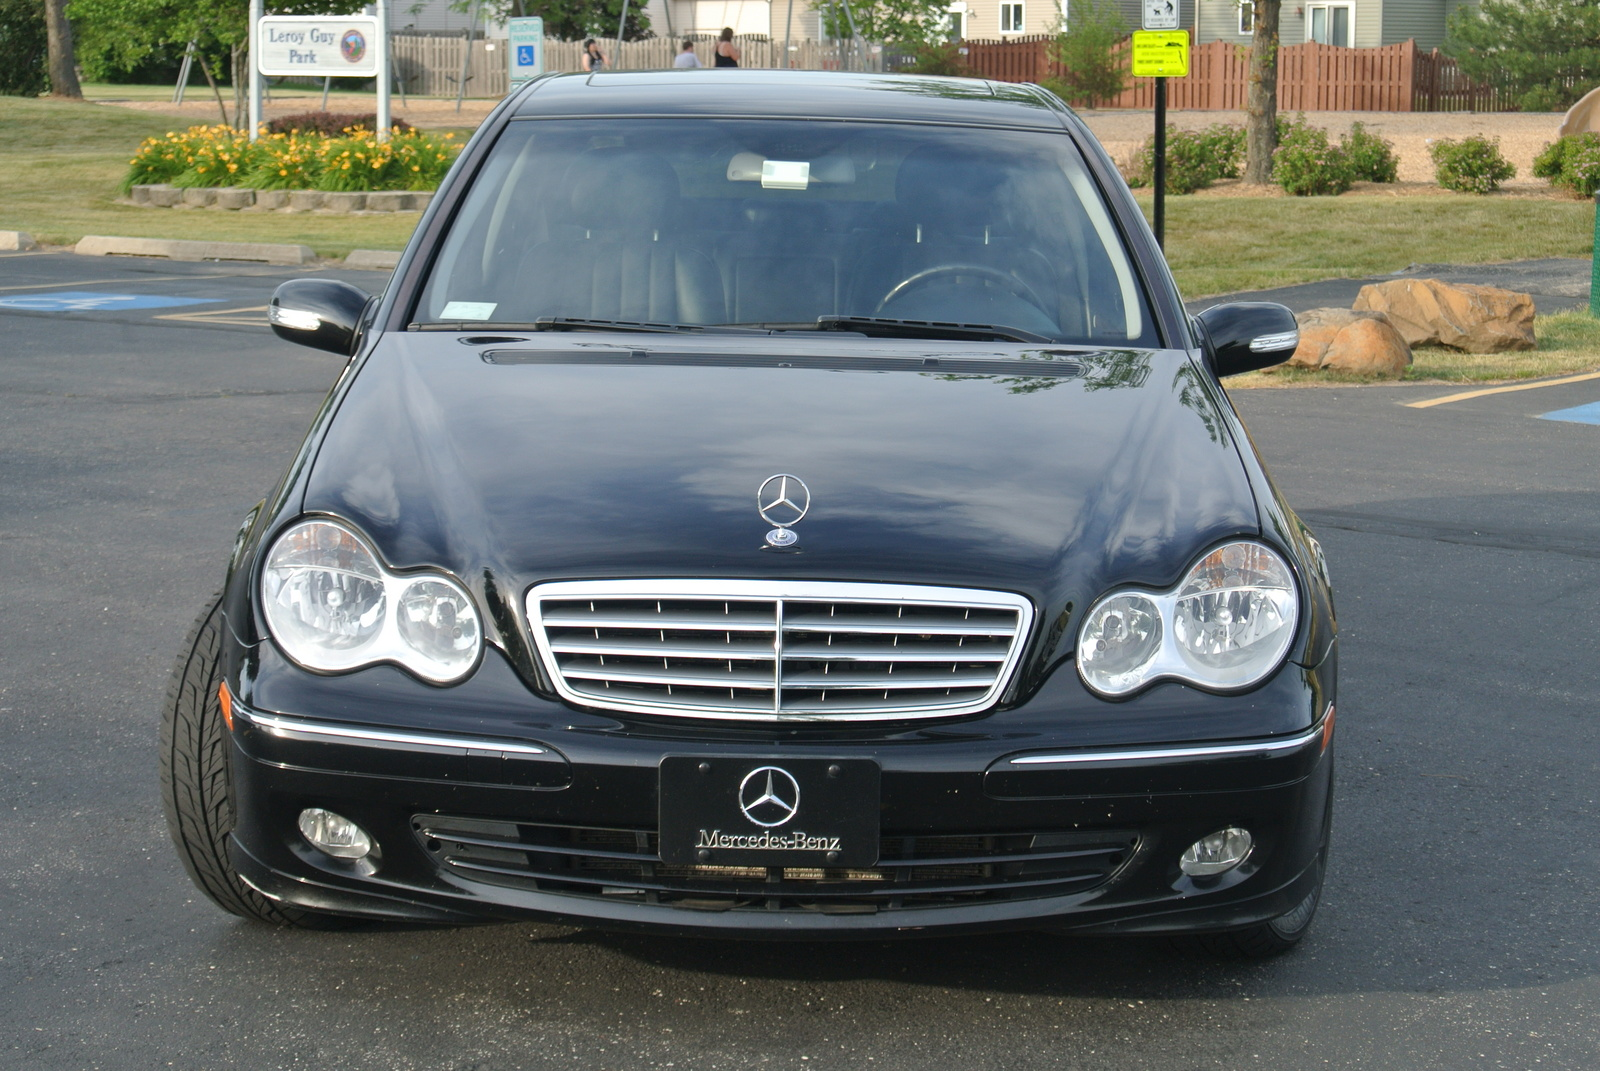 2005 mercedes benz c class pictures cargurus for Mercedes benz e class 2005